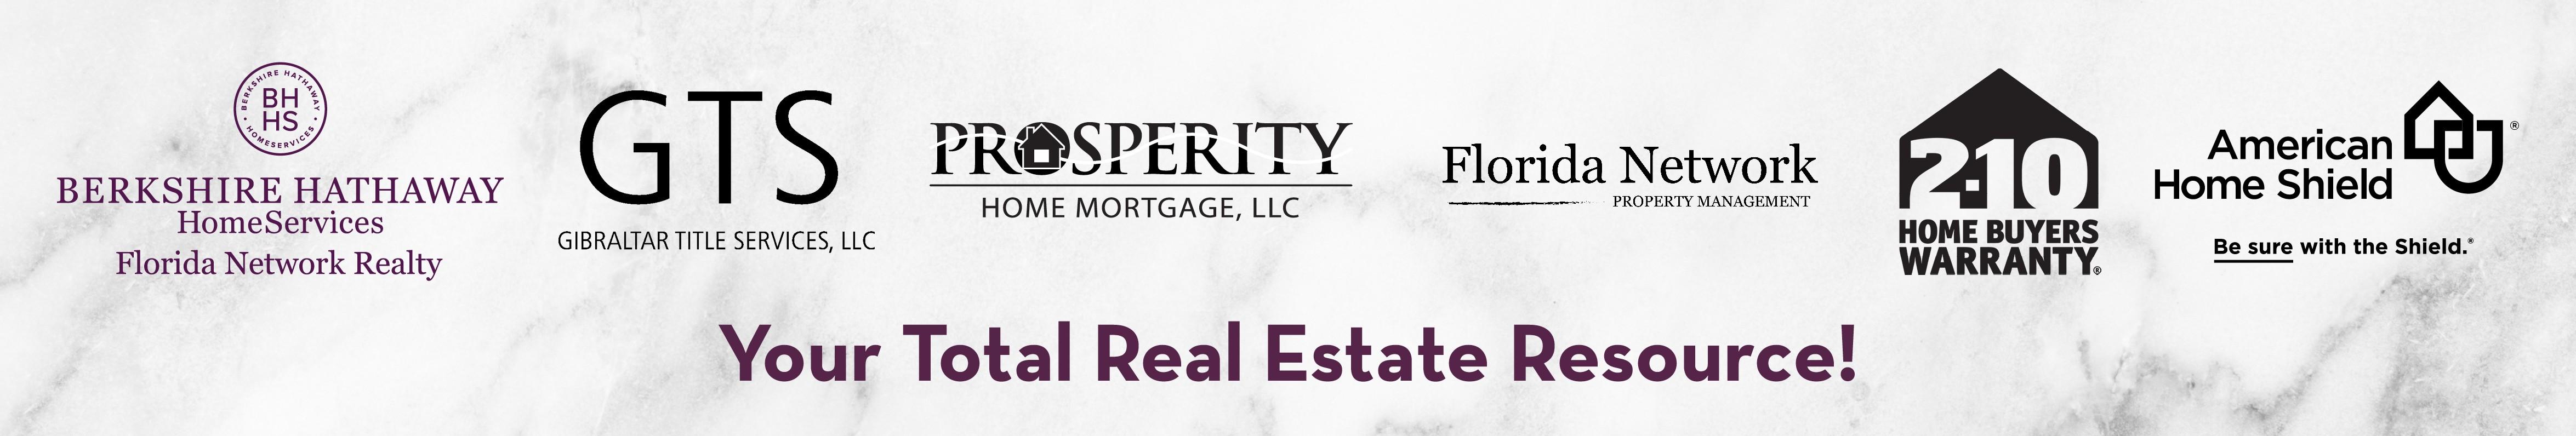 Berkshire Hathaway Homeservices Florida Network Realty Linkedin